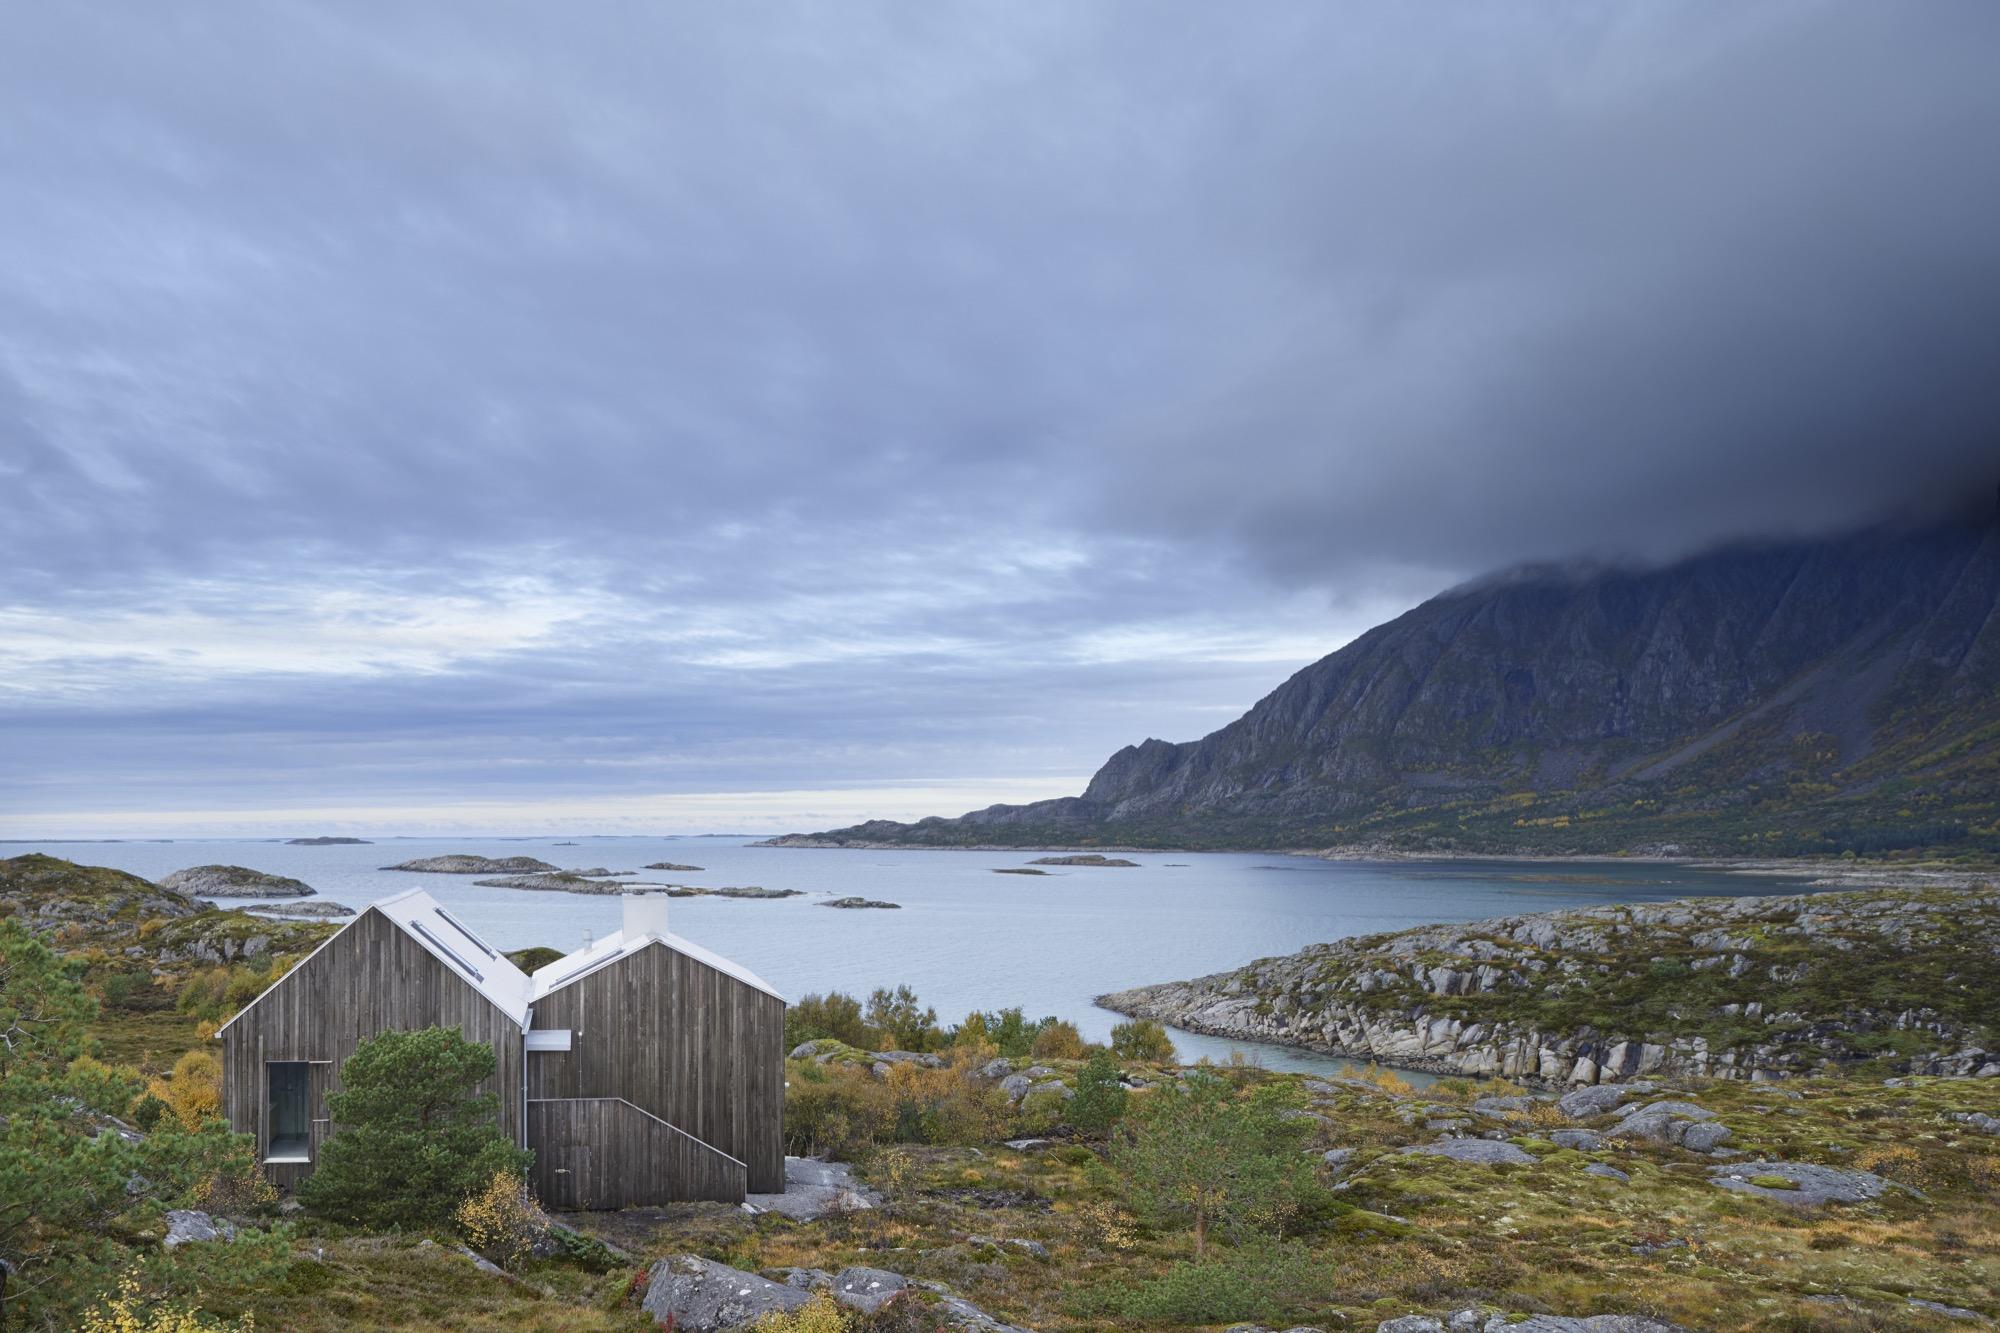 Photo by Åke E:son Lindman